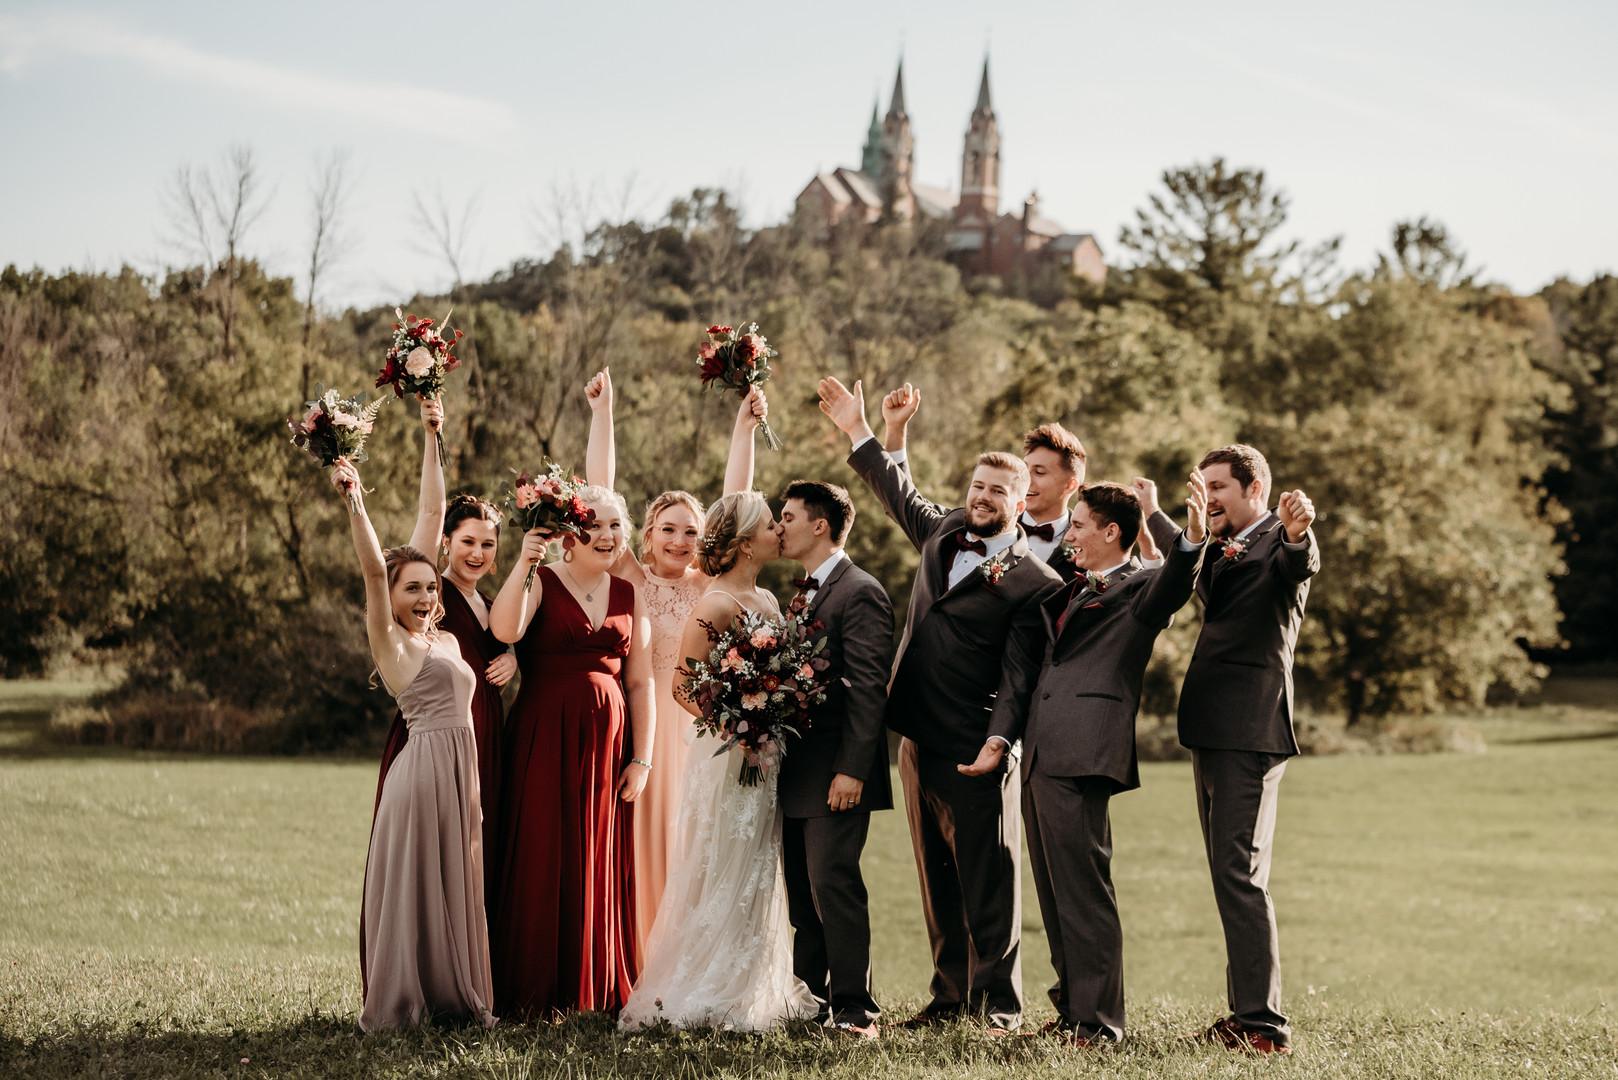 abigale-joe-weddingsneak-1-22.jpg